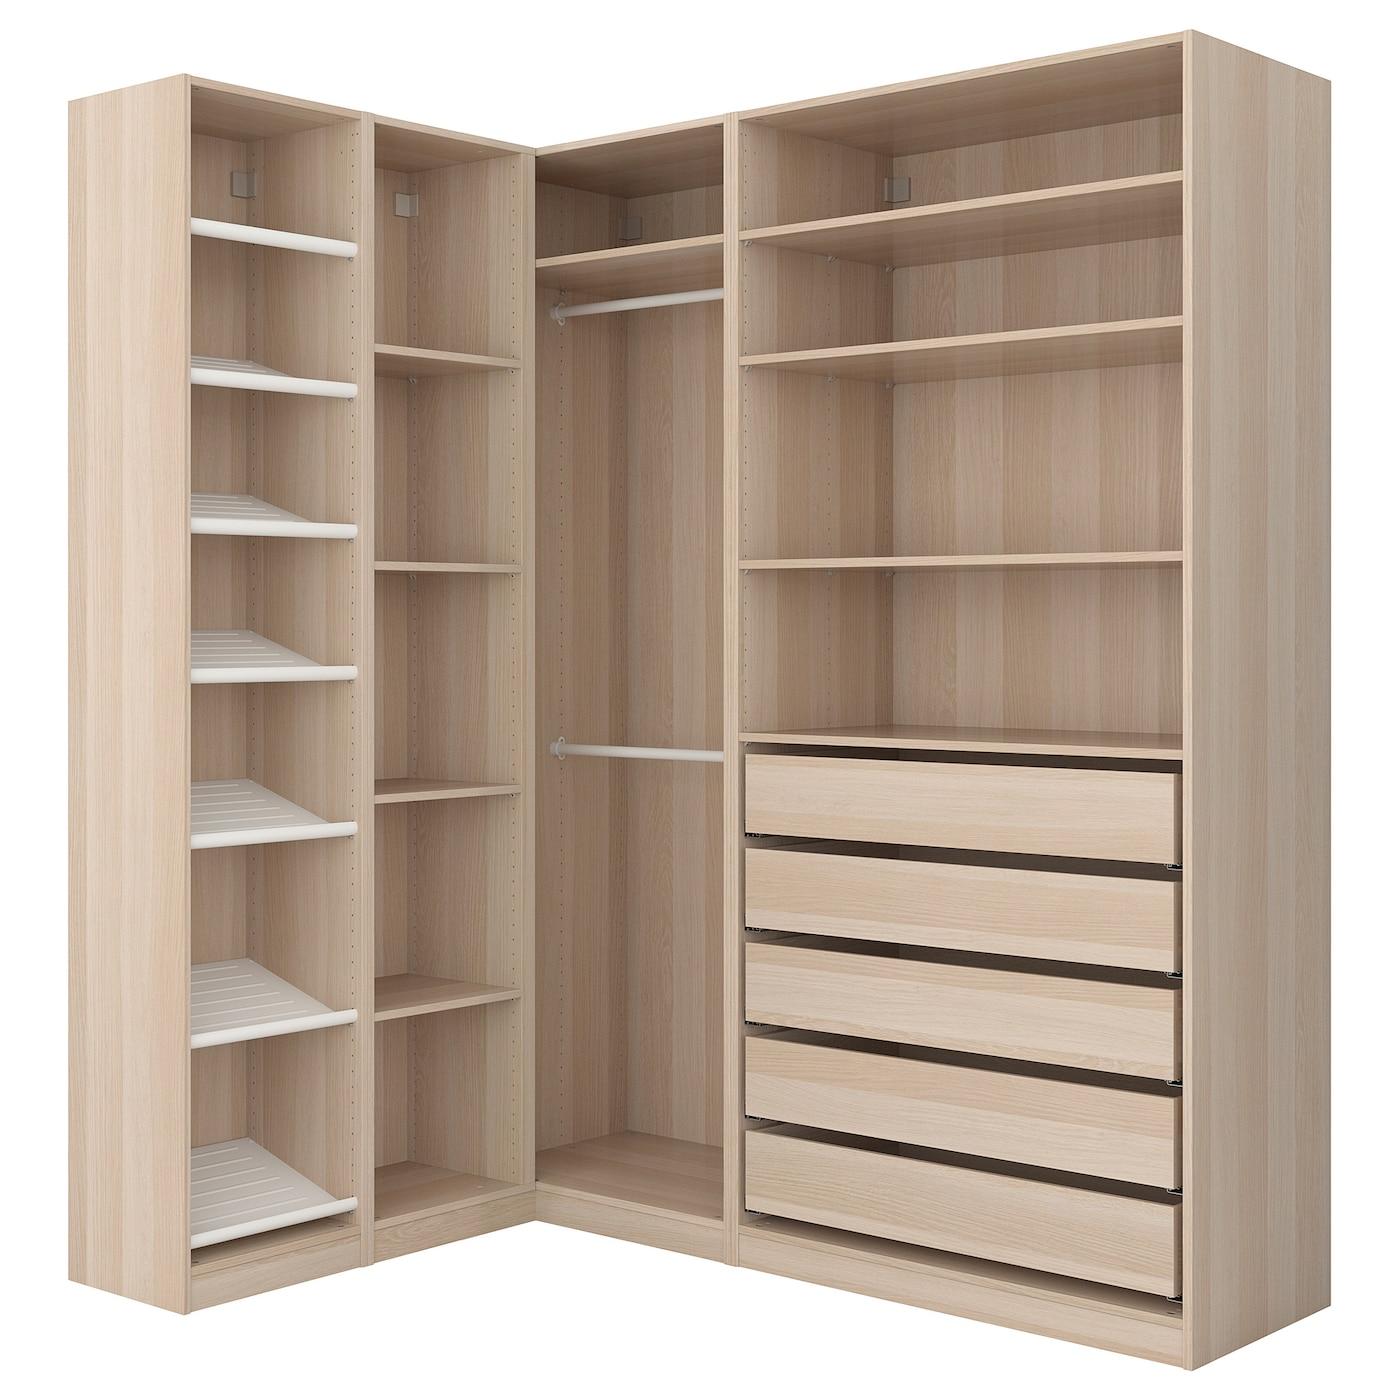 pax corner wardrobe white stained oak effect 160 188 x 236. Black Bedroom Furniture Sets. Home Design Ideas